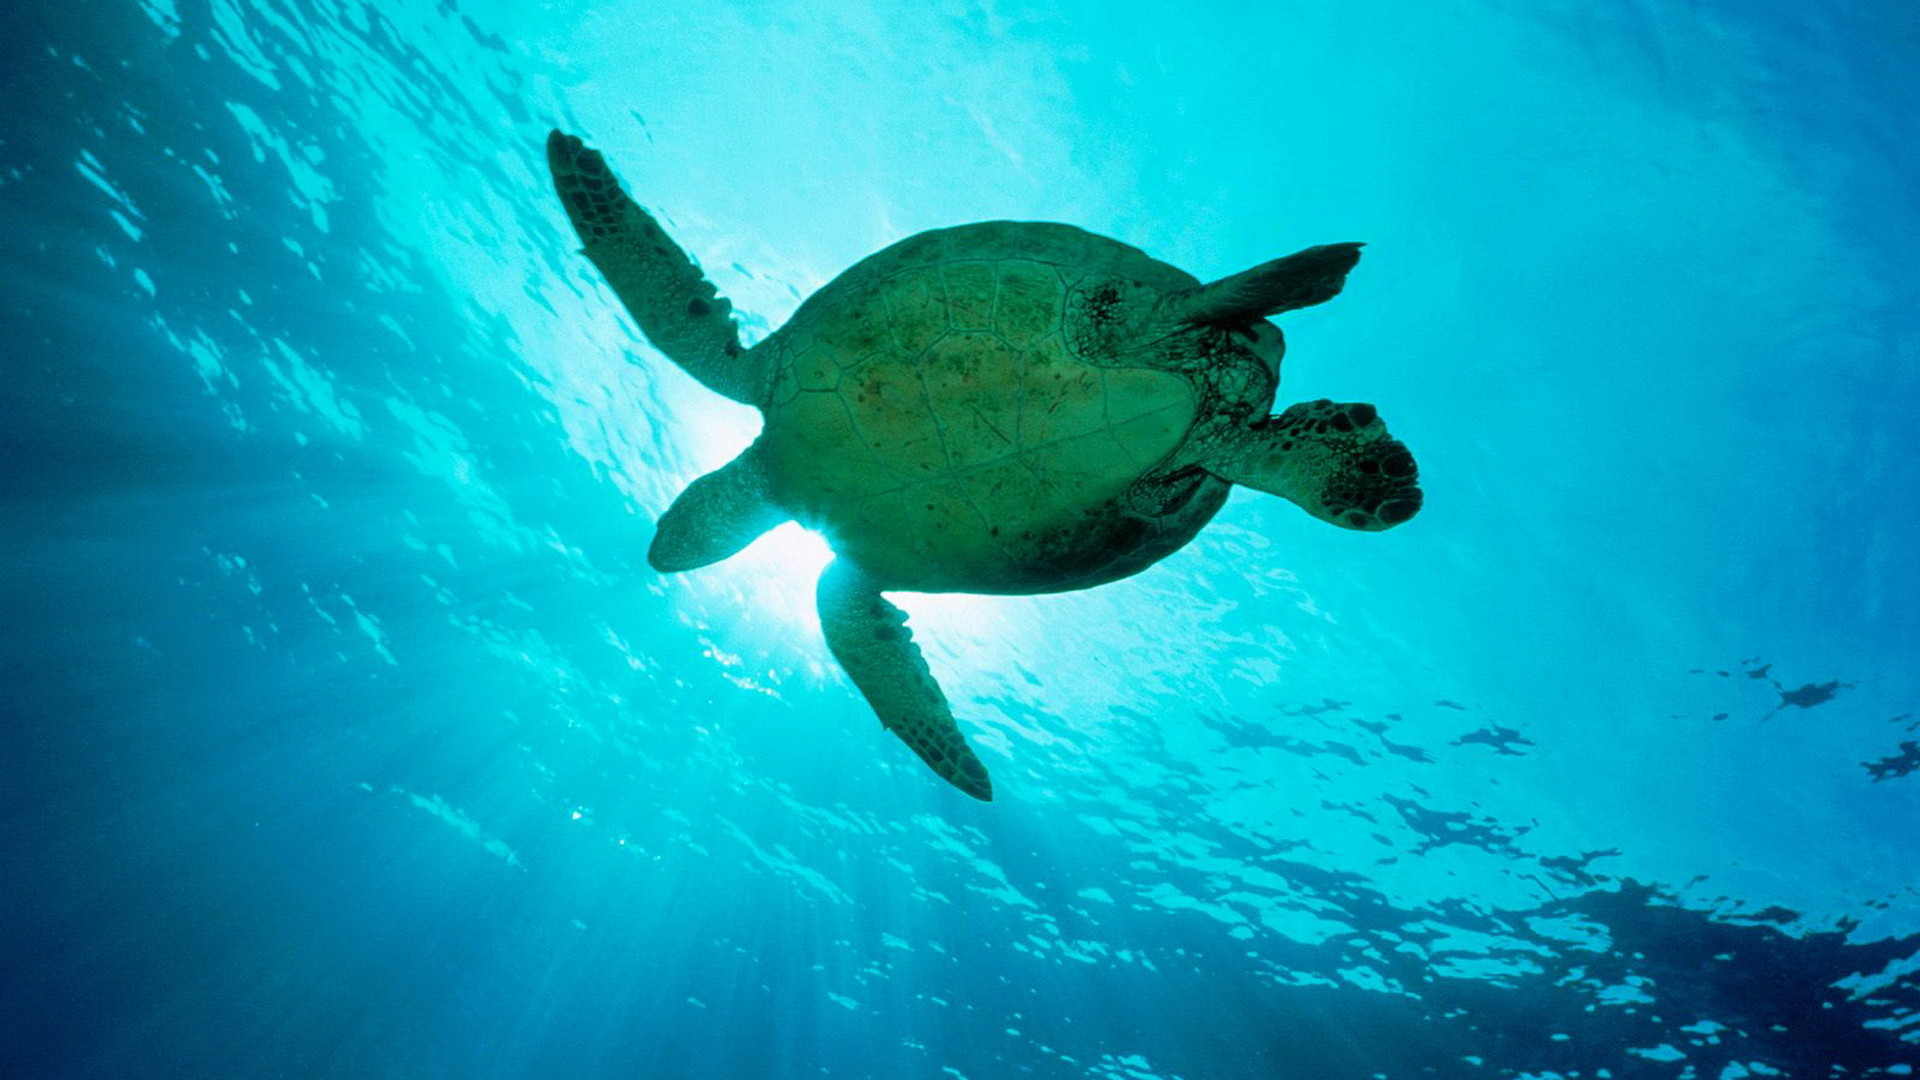 Sea Turtles Wallpaper Sea, Turtles